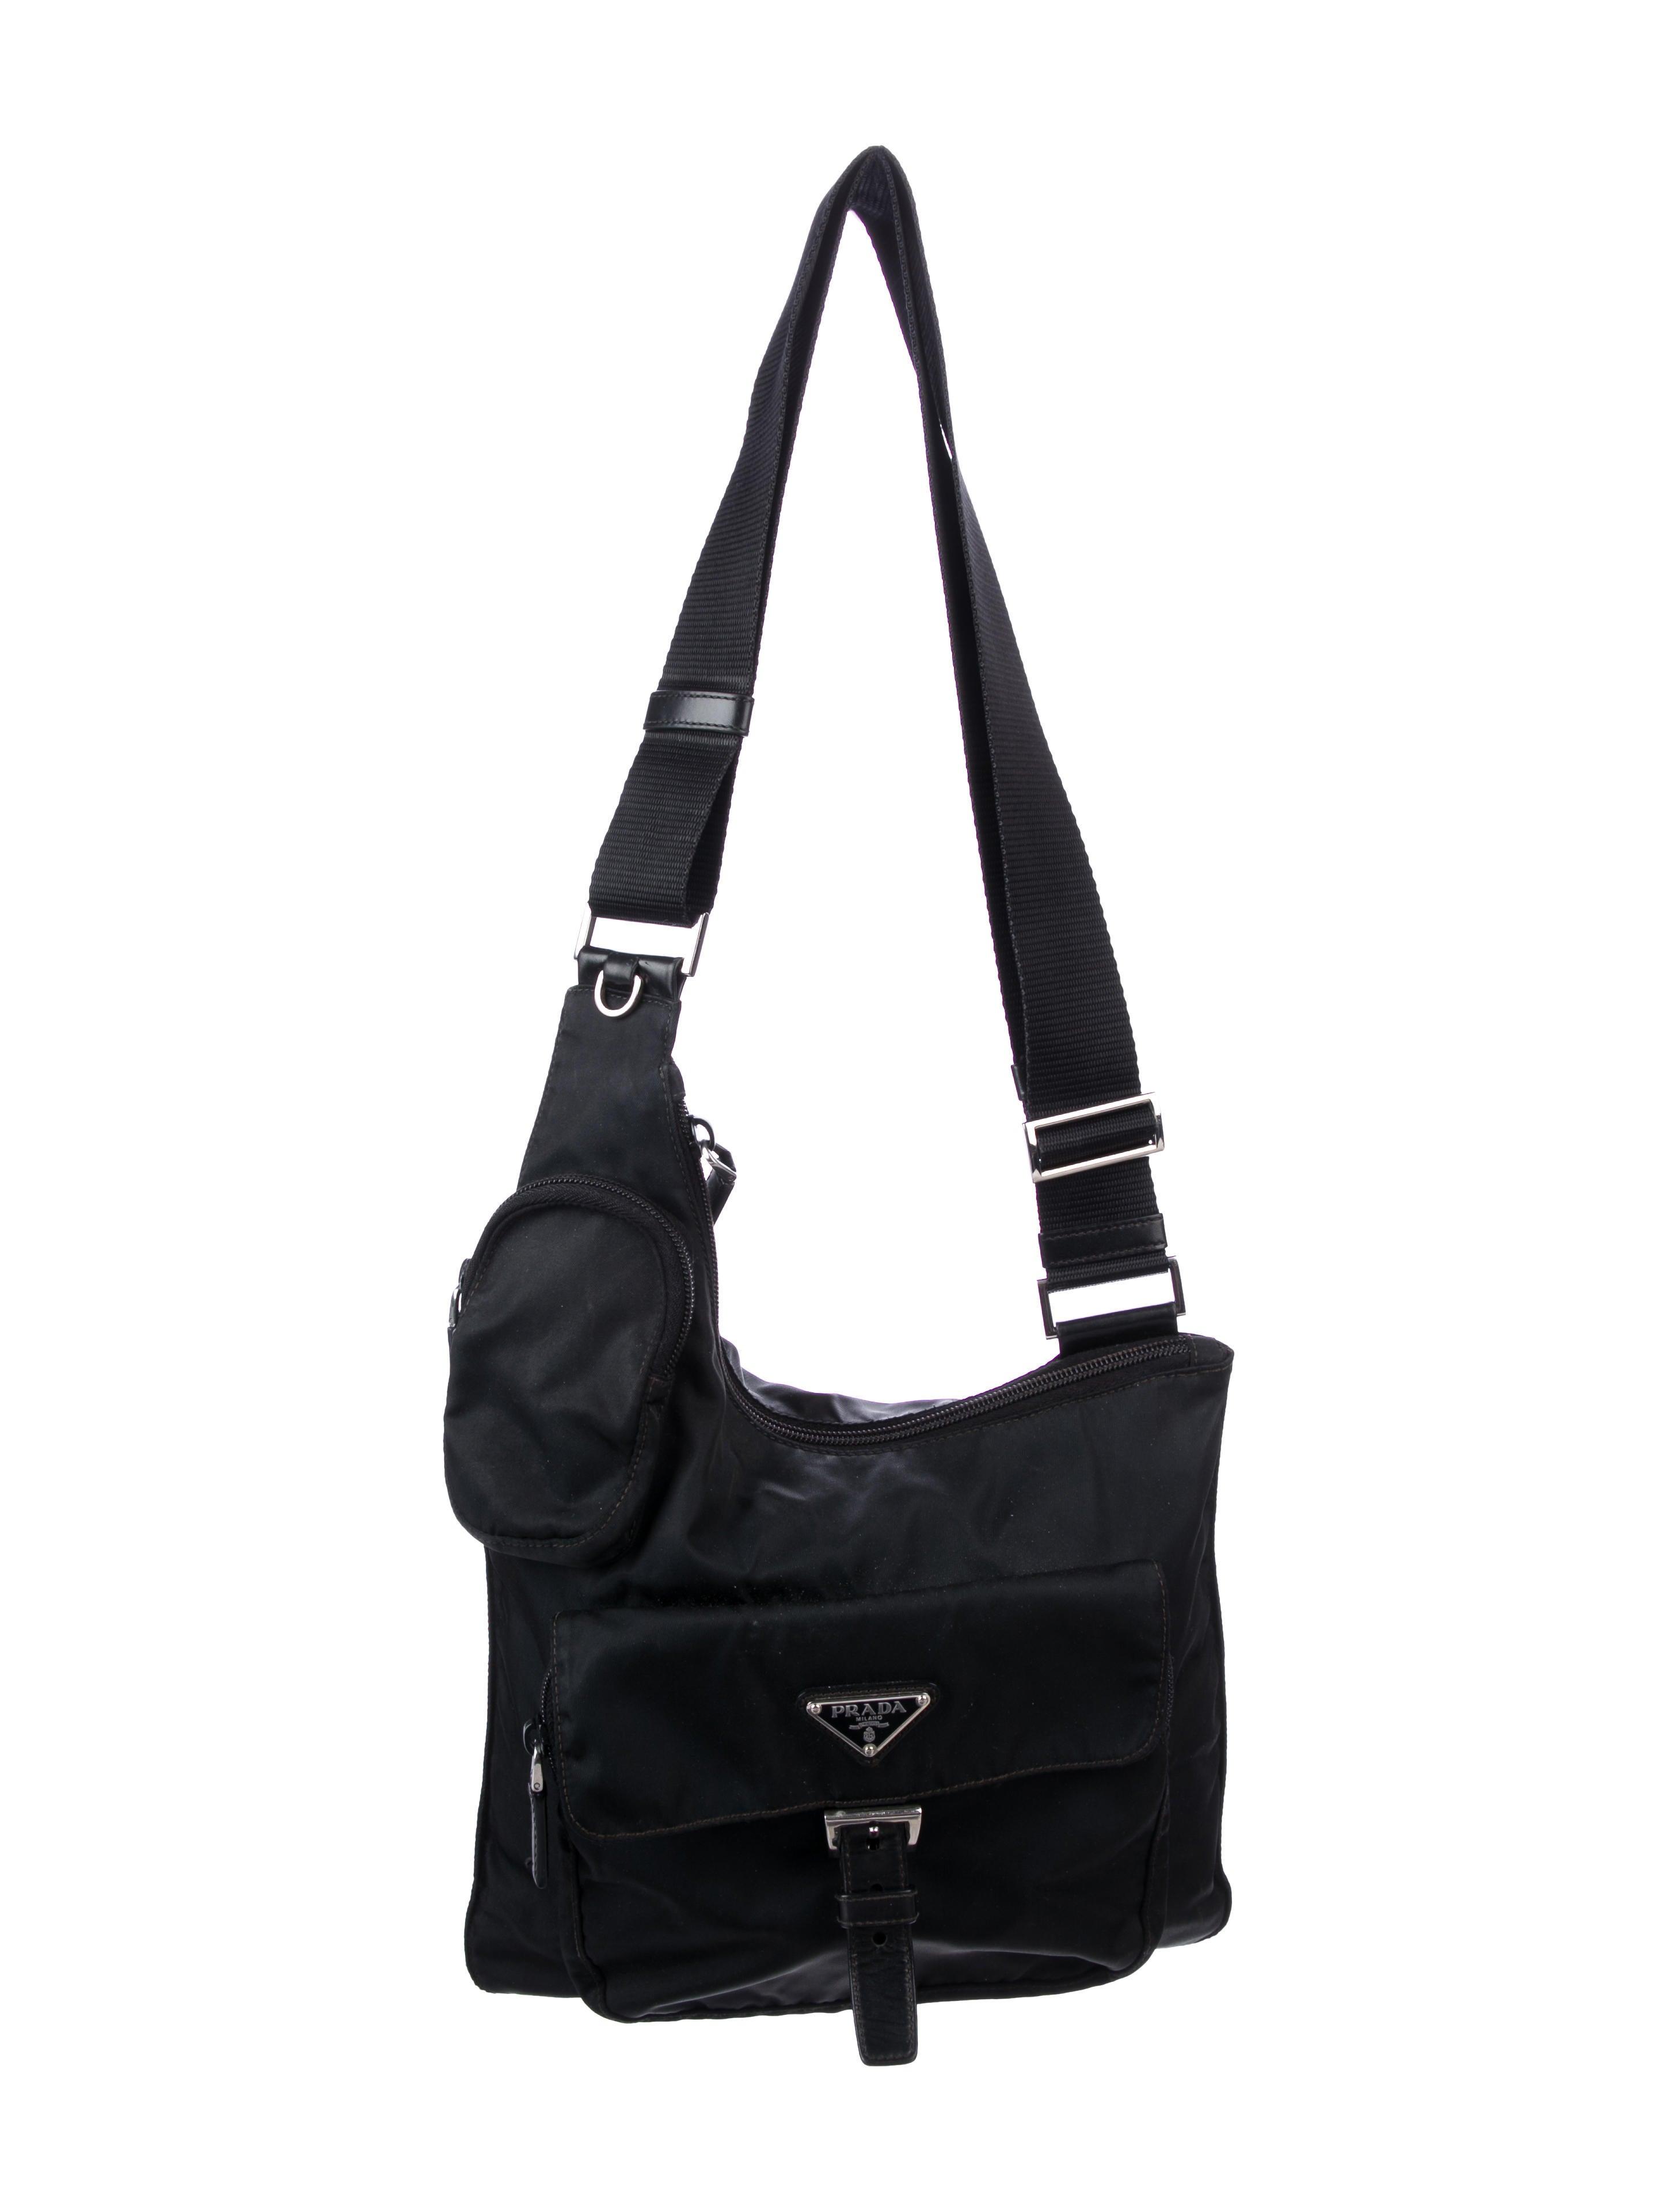 6710fa20bb2 Prada Tessuto Crossbody Bag - Handbags - PRA280770 | The RealReal